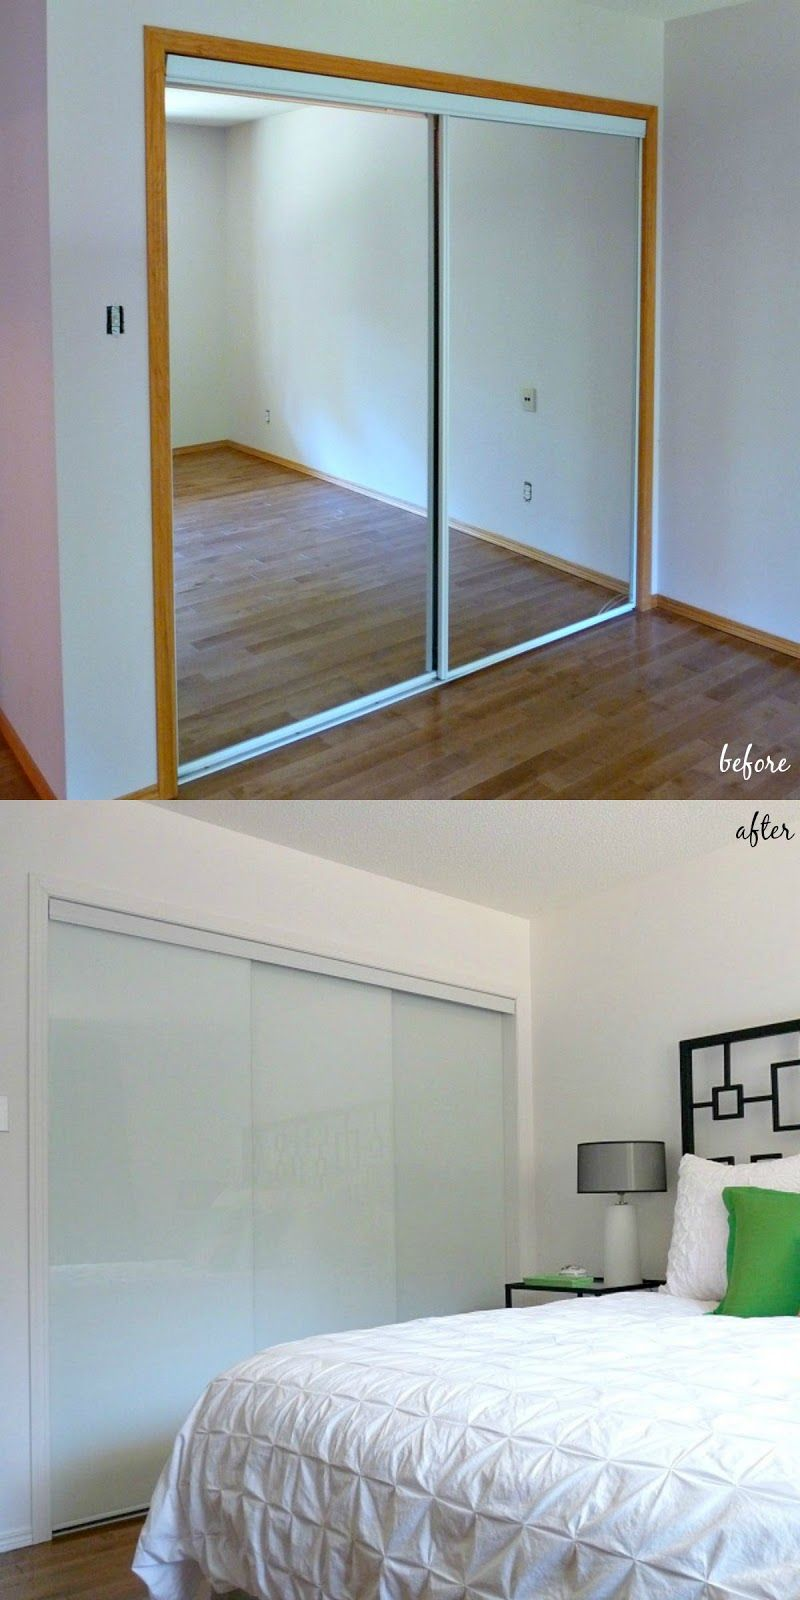 Interior sliding closet door - New White Glass Sliding Closet Doors In The Bedroom